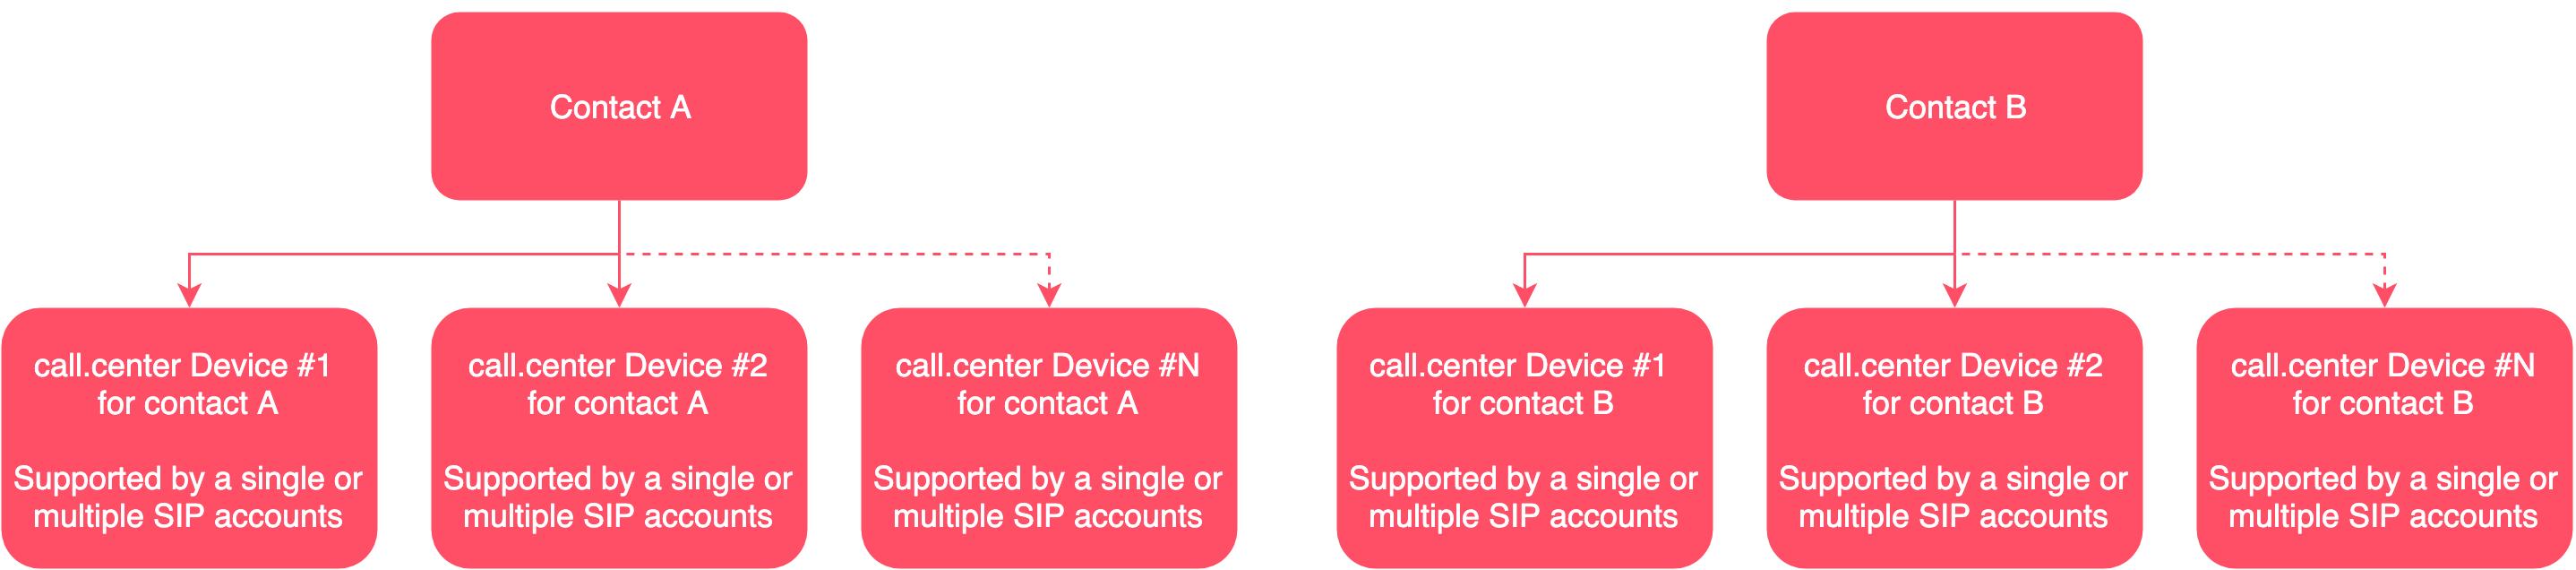 User Guide | call center™